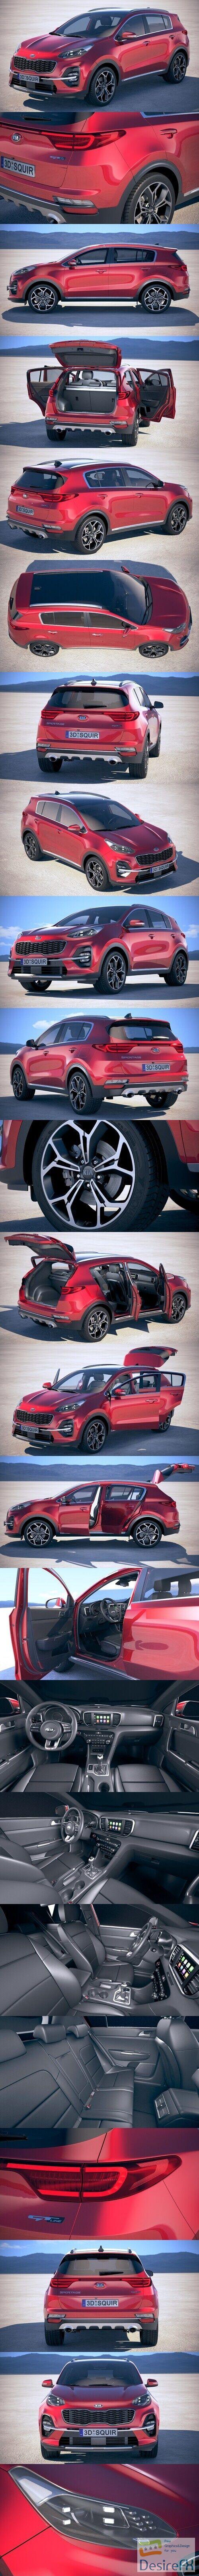 Kia Sportage with interior 2019 3D Model